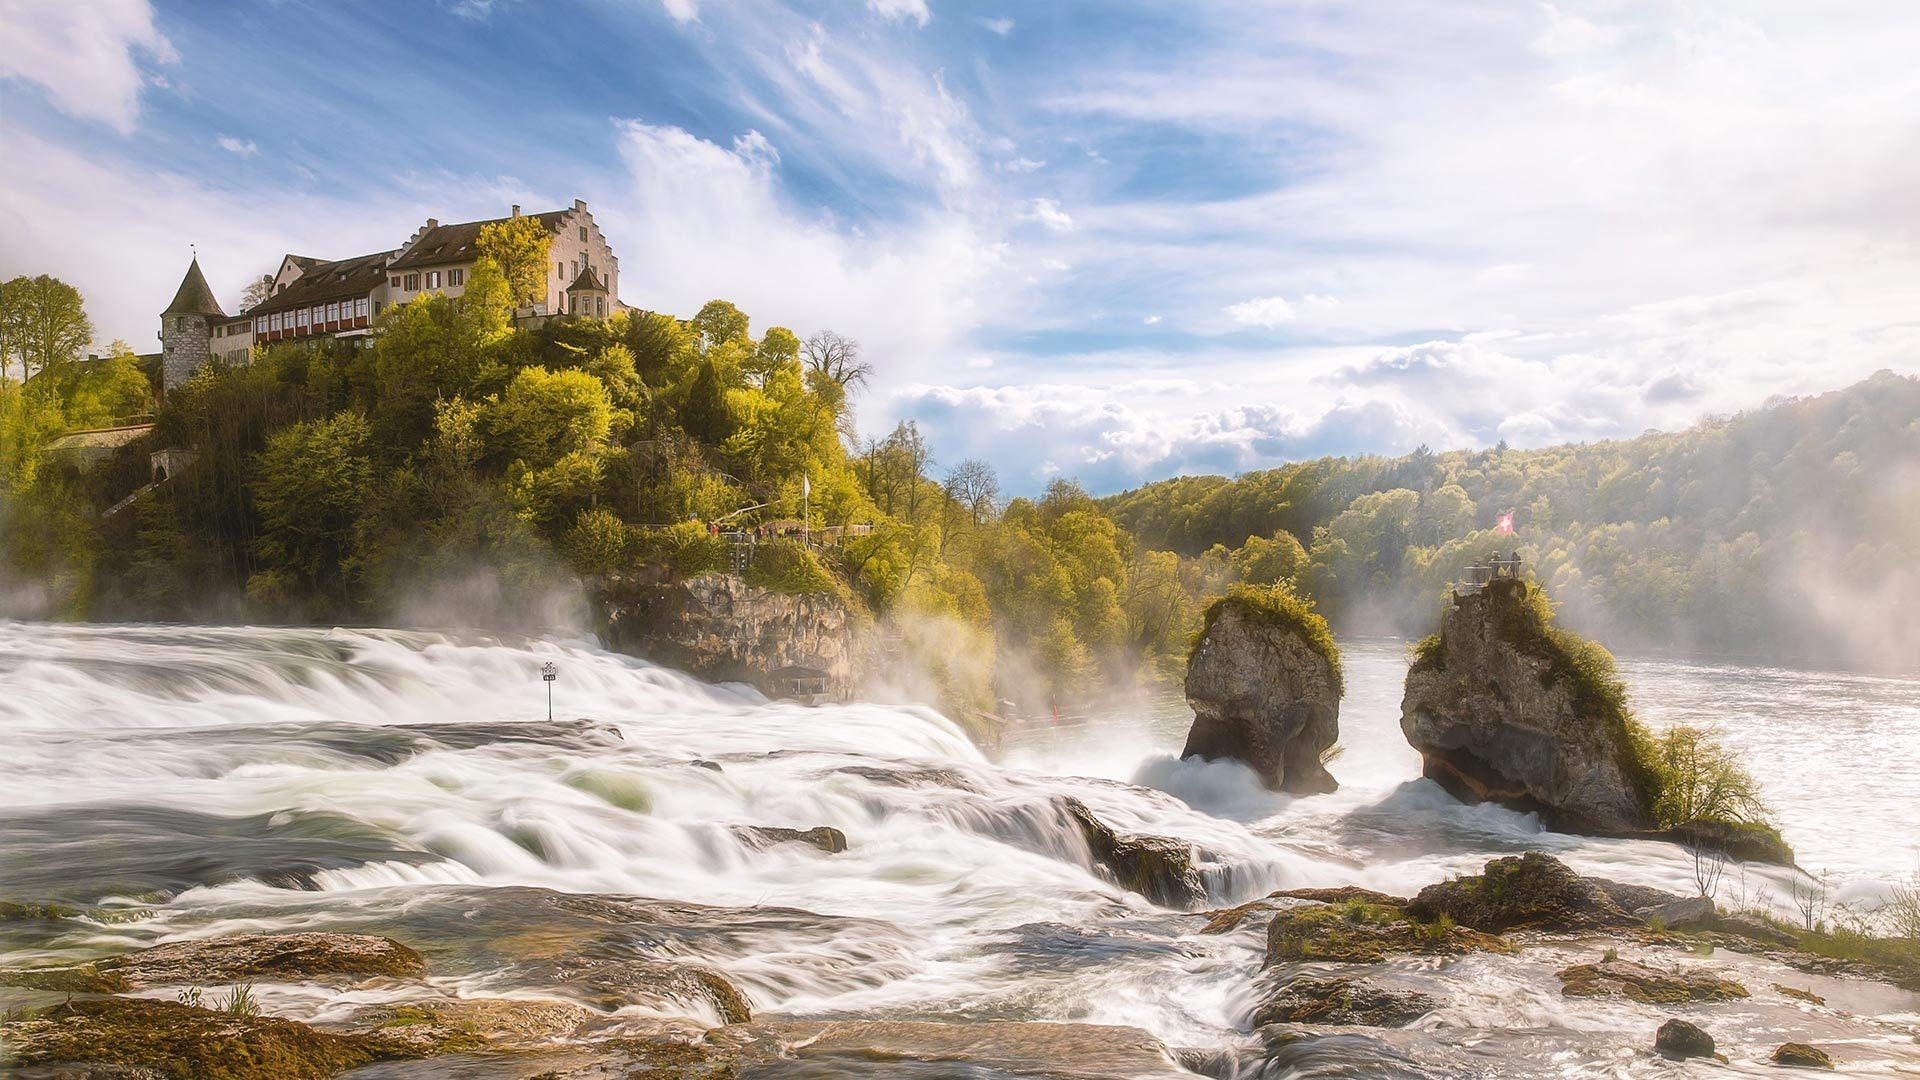 Geng's Linde Ausflugsziele Rheinfall - Foto: Dane Vetter